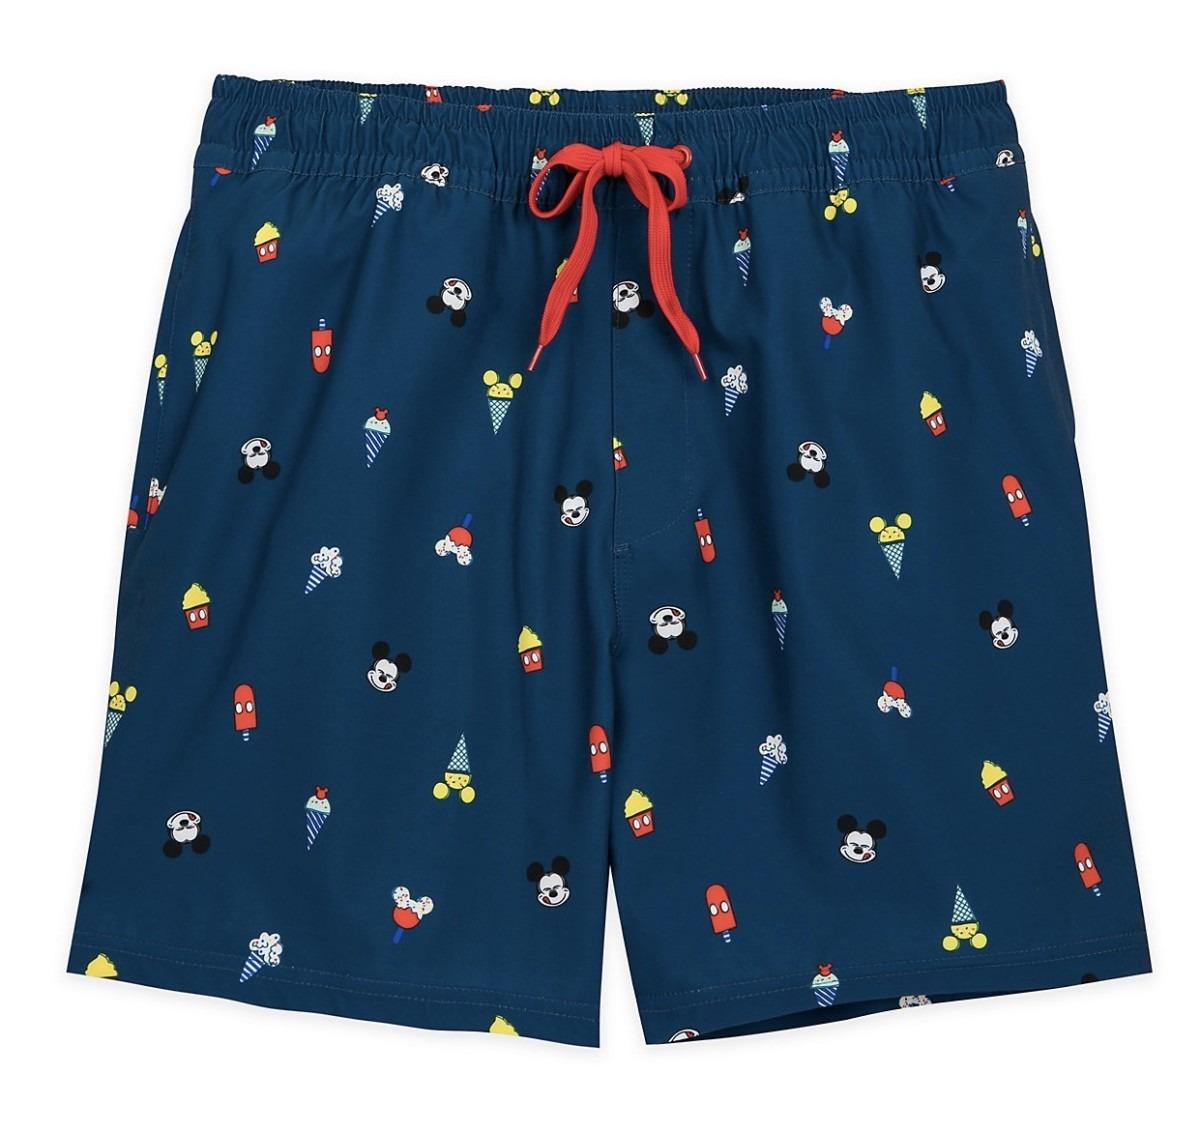 Summer Fun Swim Essentials from shopDisney 5